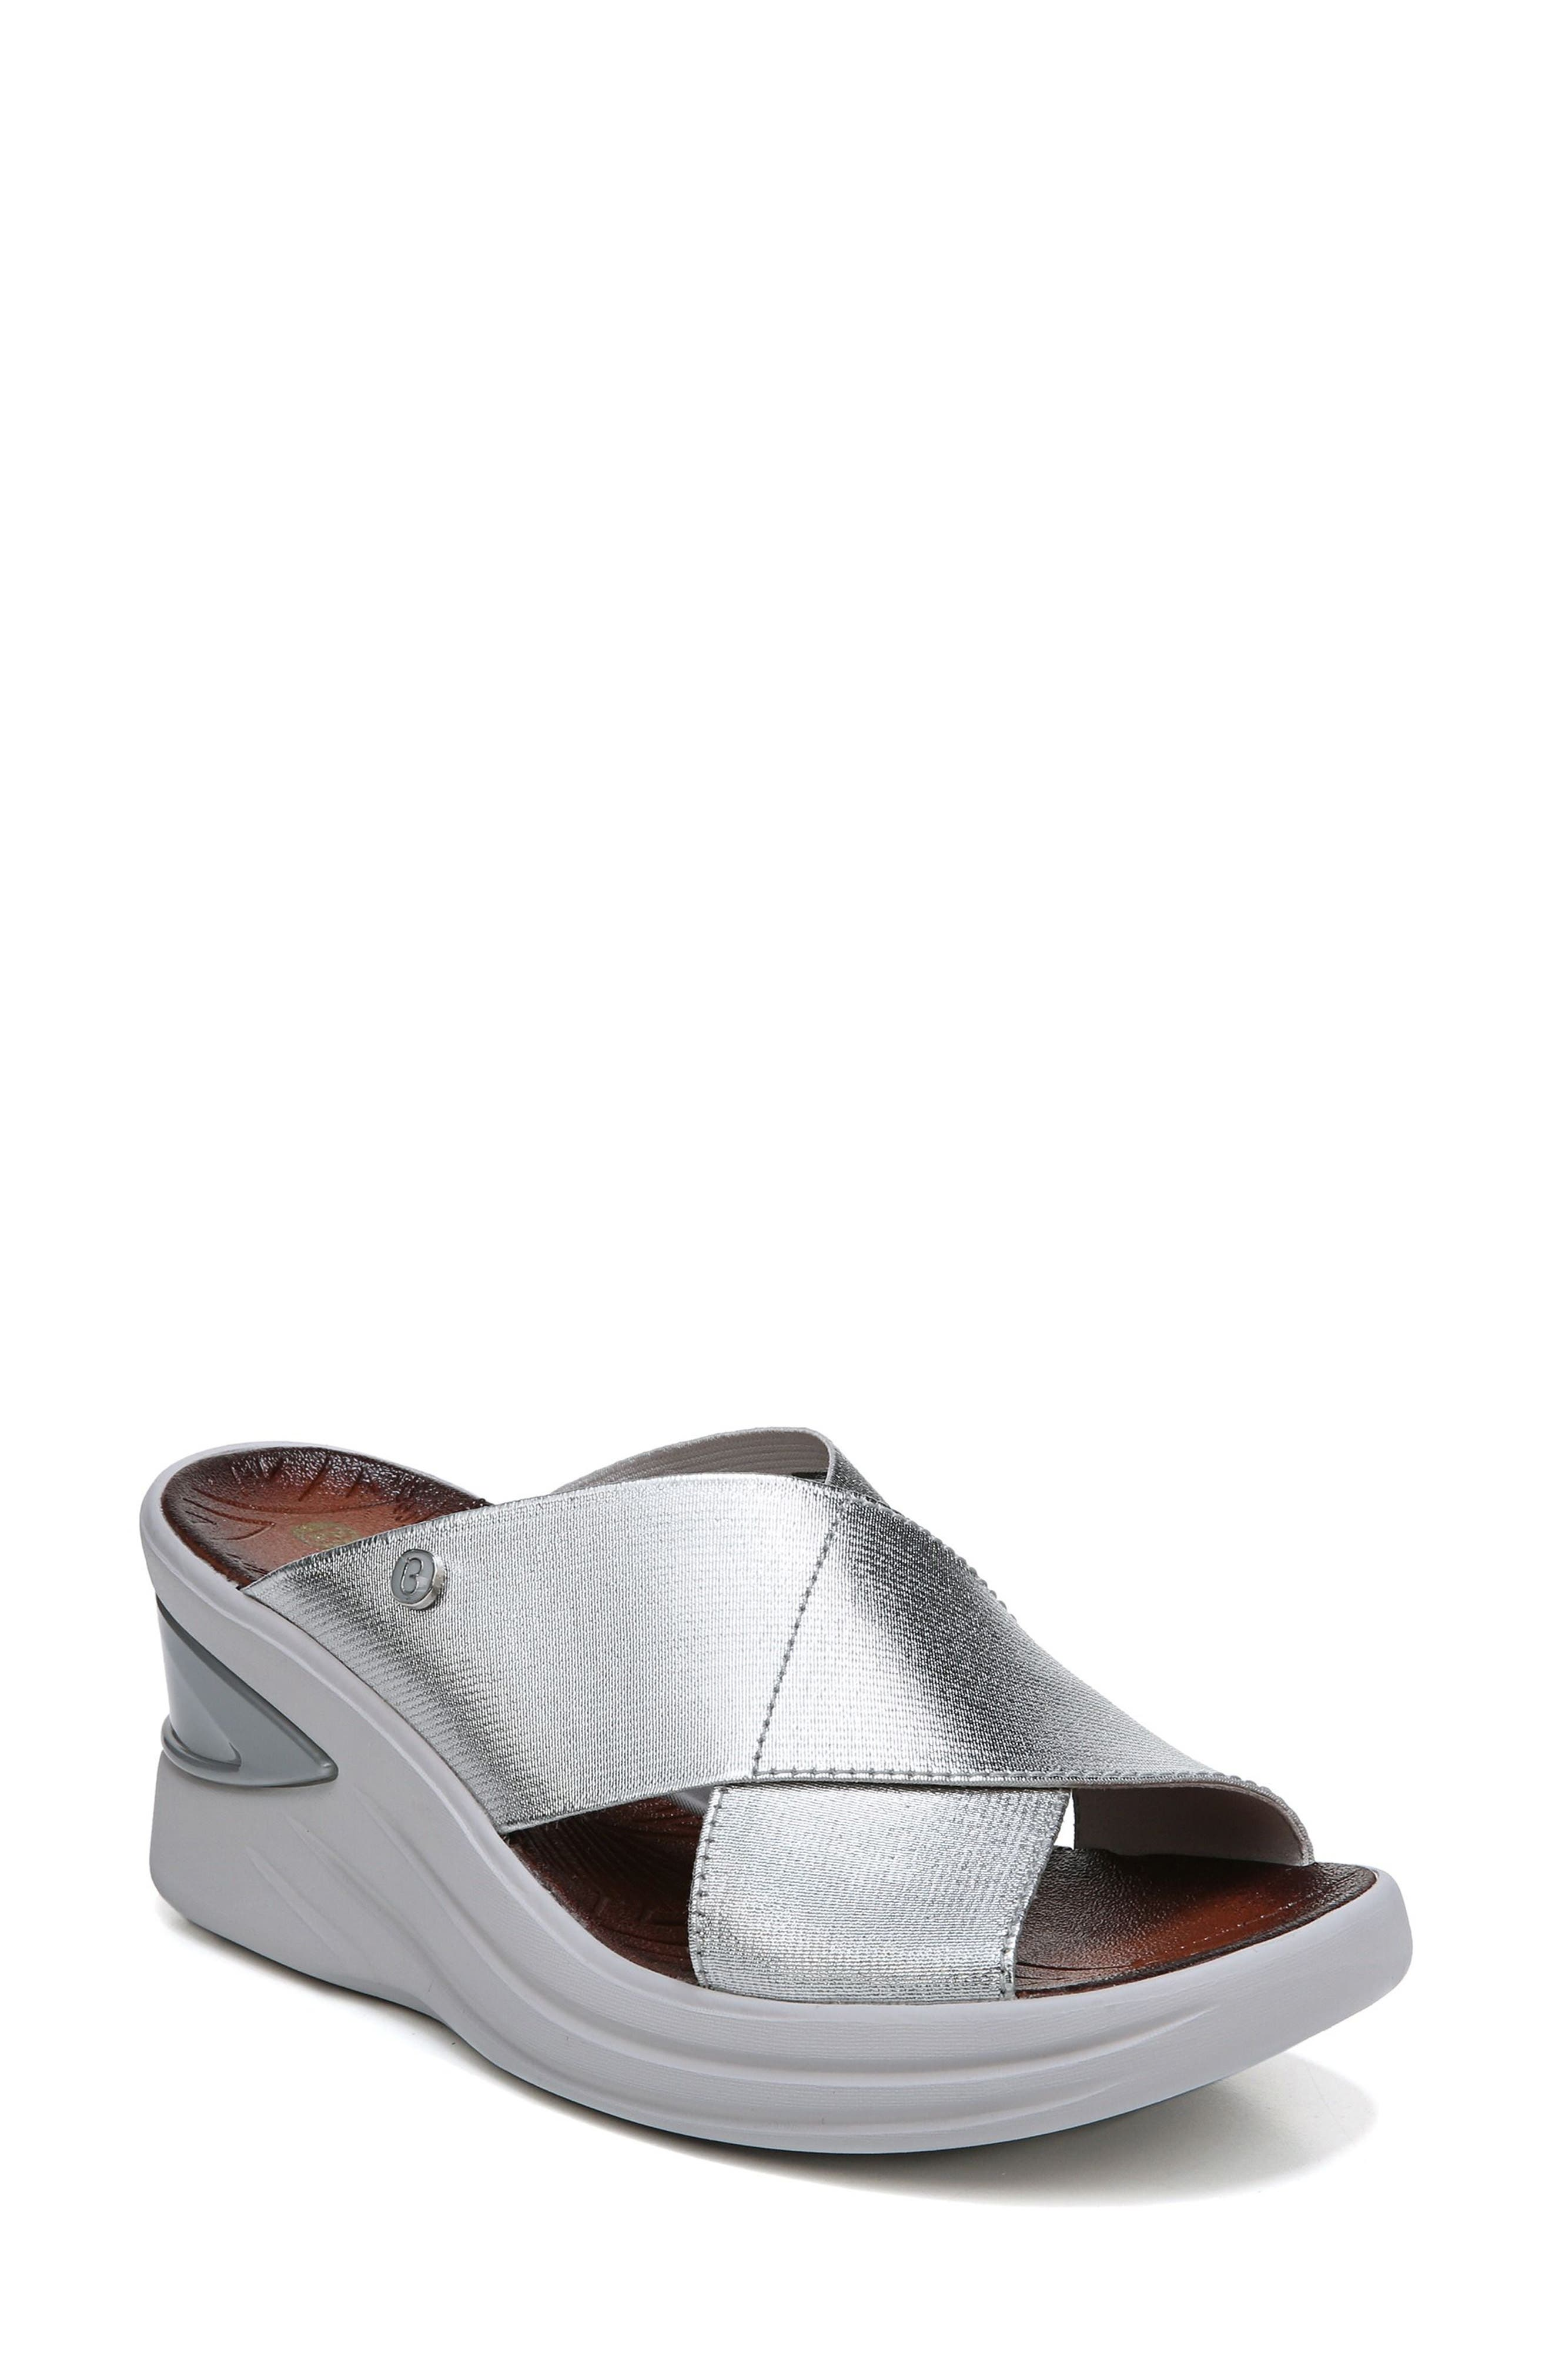 Bzees Vista Slide Sandal, Metallic